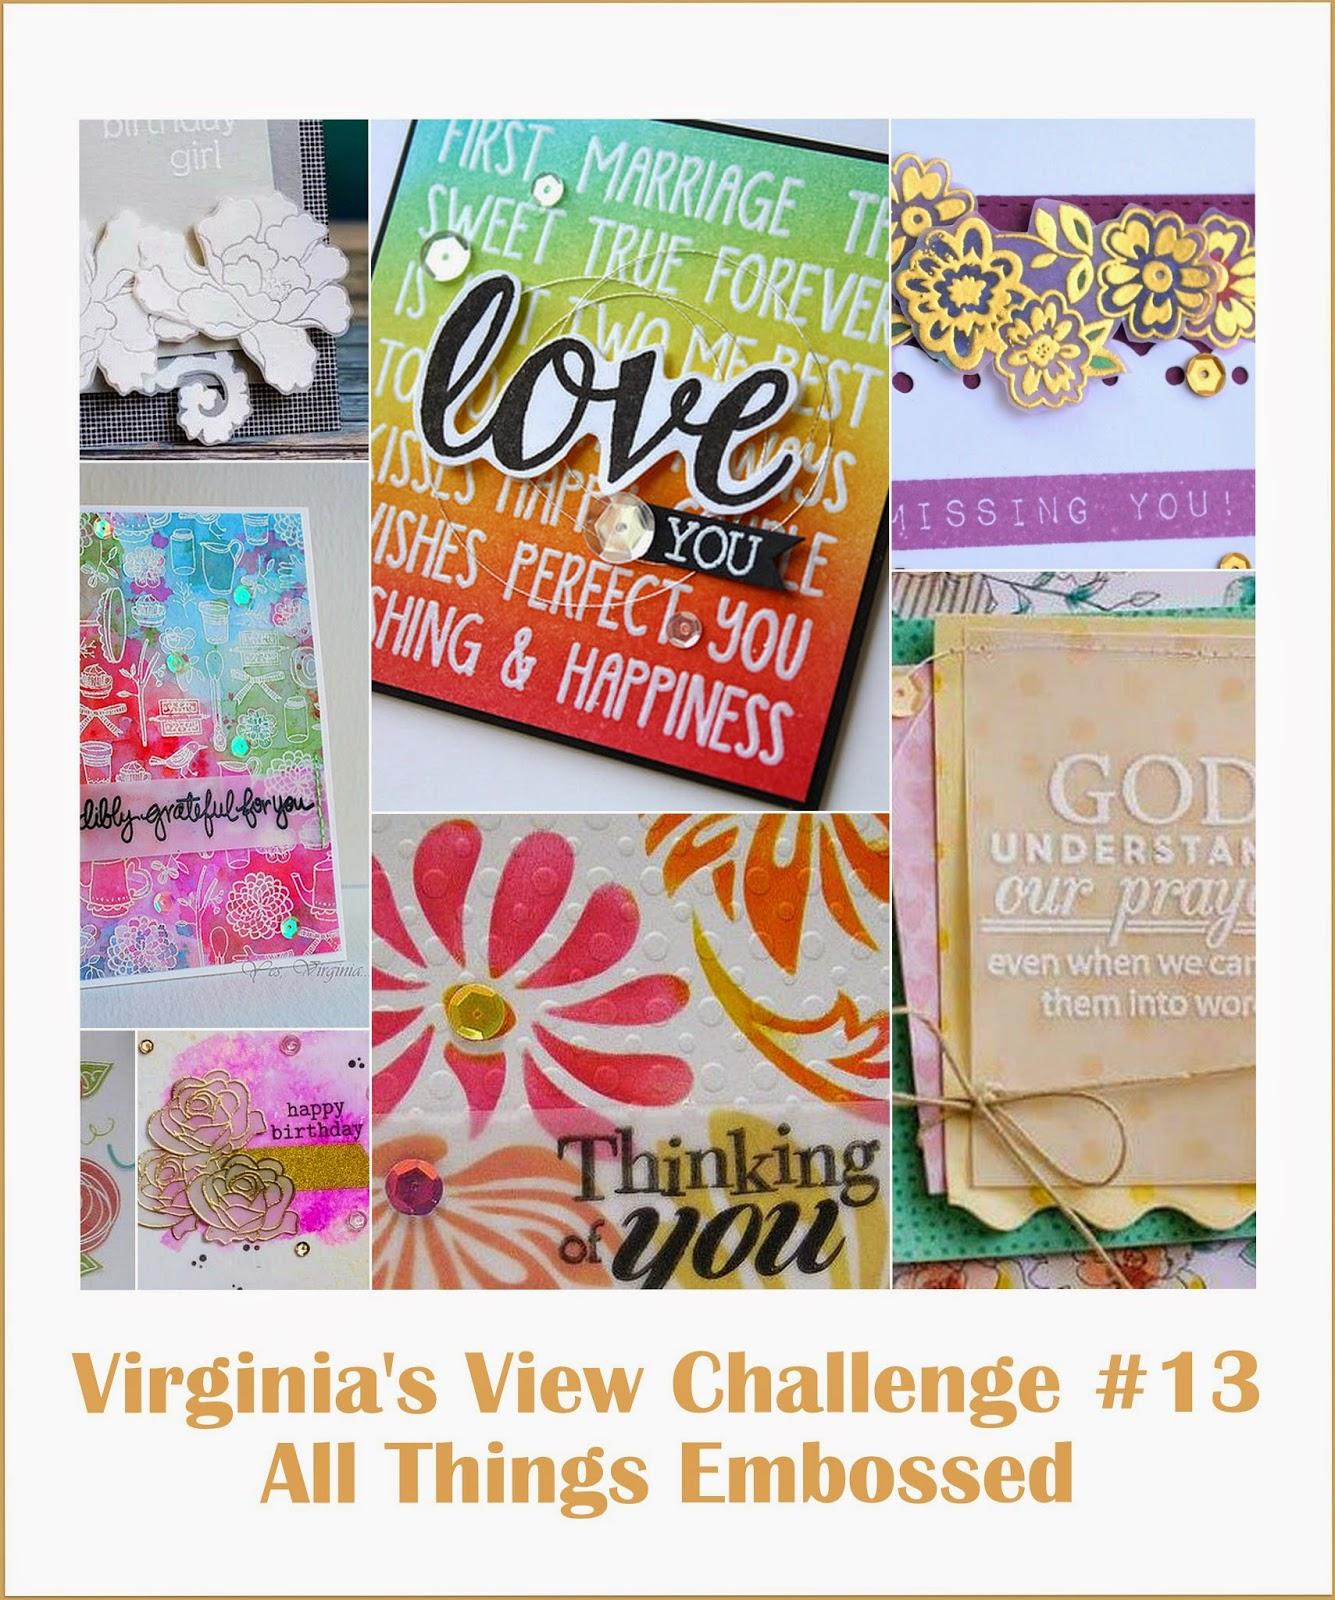 http://virginiasviewchallenge.blogspot.ie/2015/03/virginias-view-challenge-13_1.html